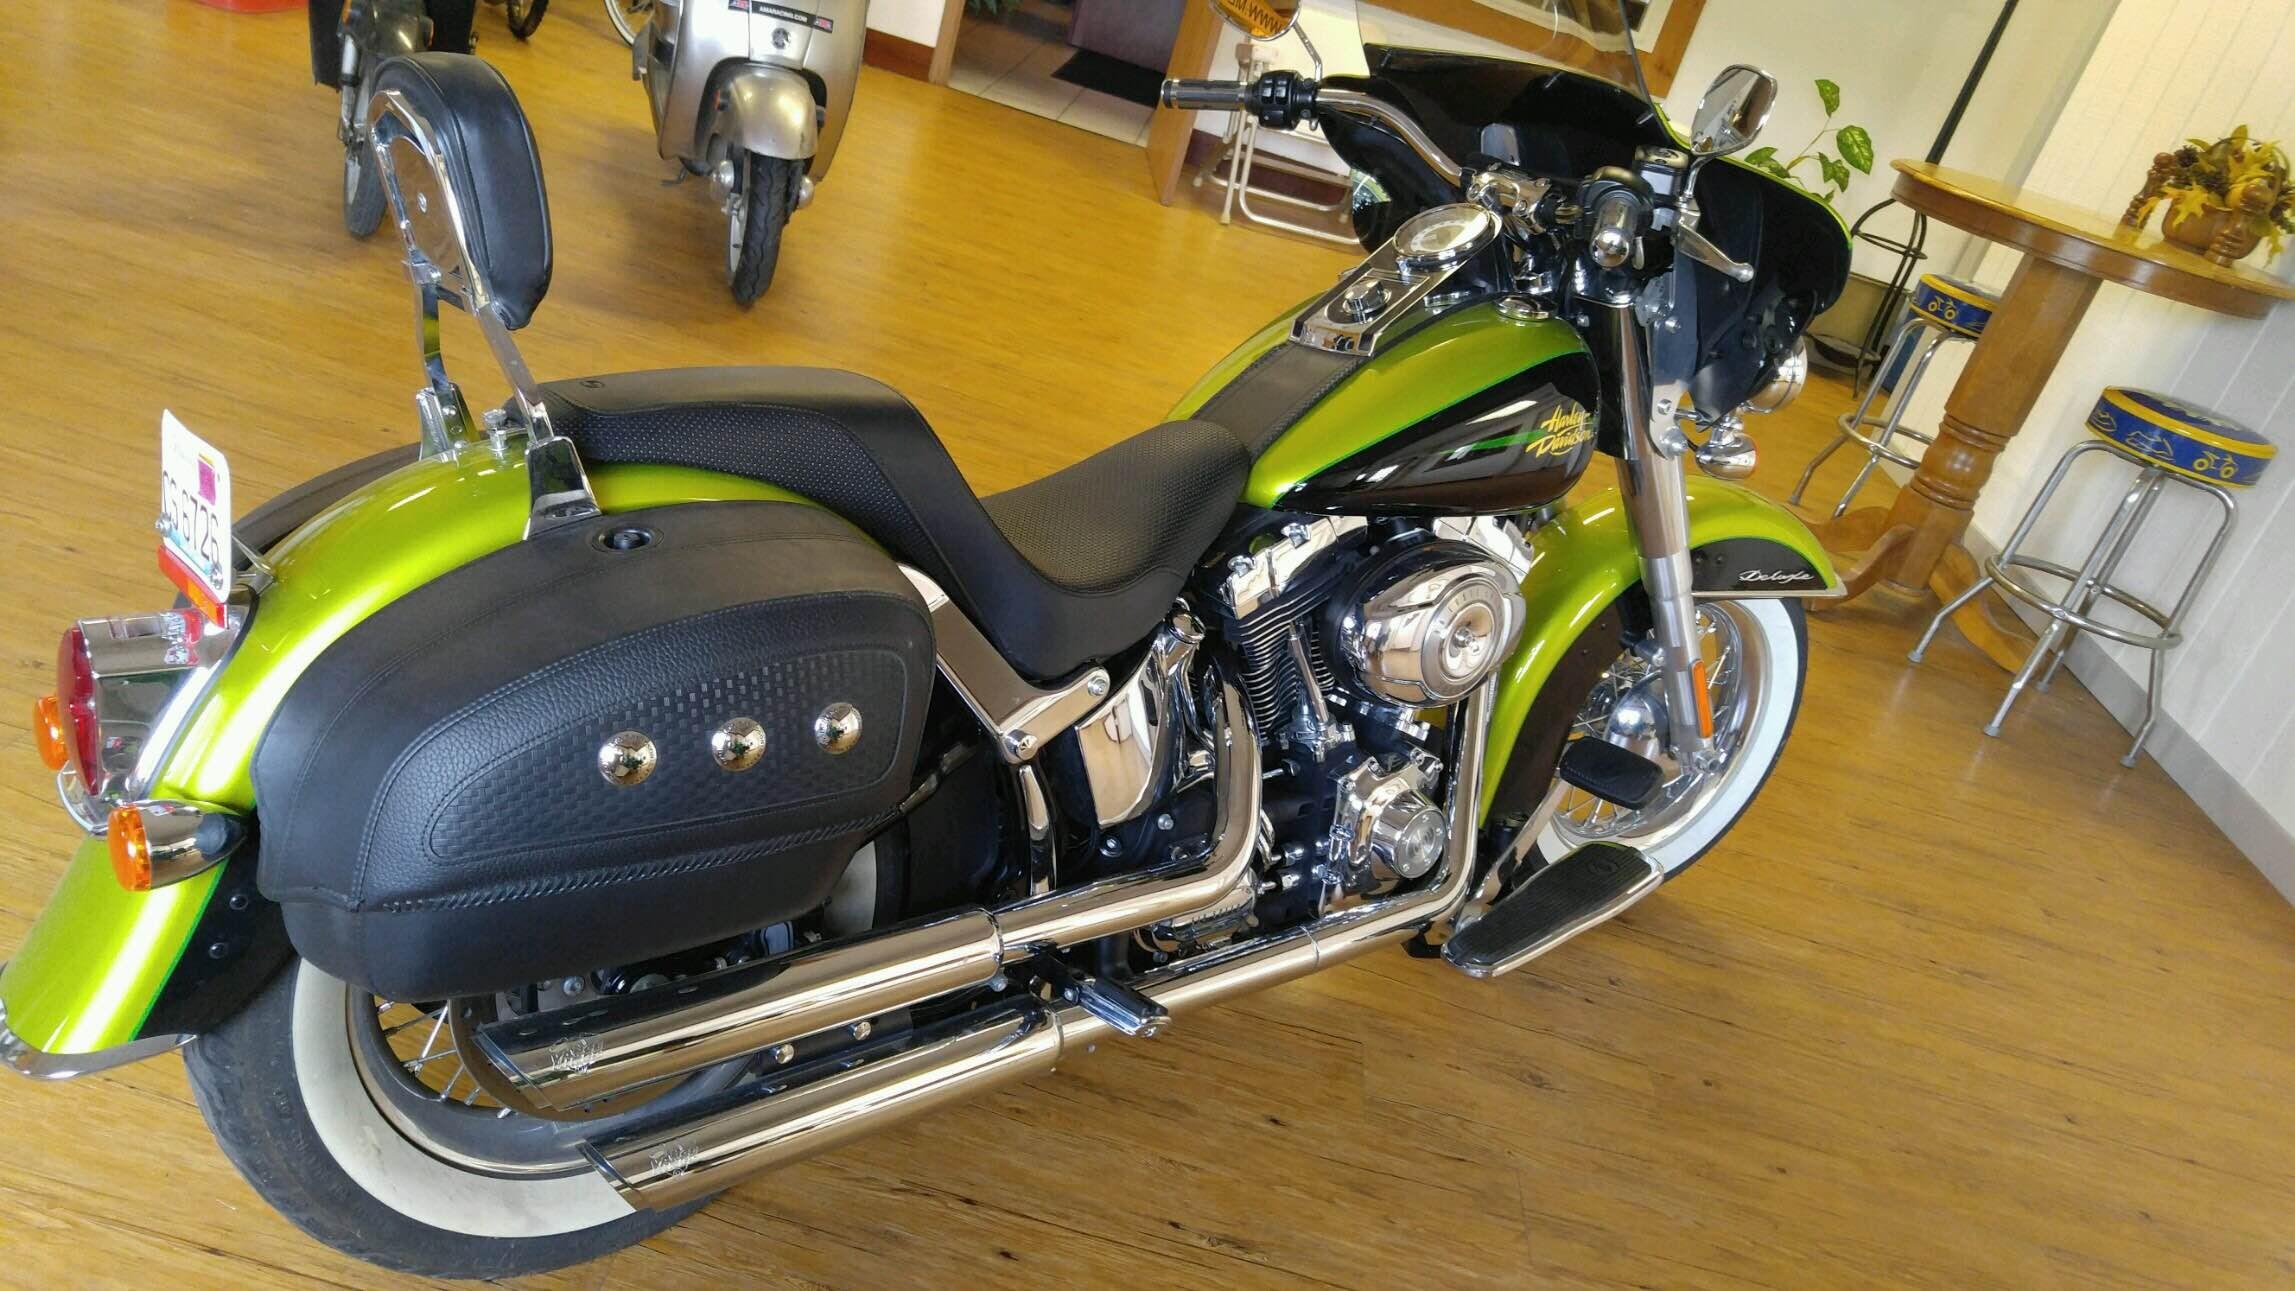 Apple Green Harley Davidson Fairing For Sale